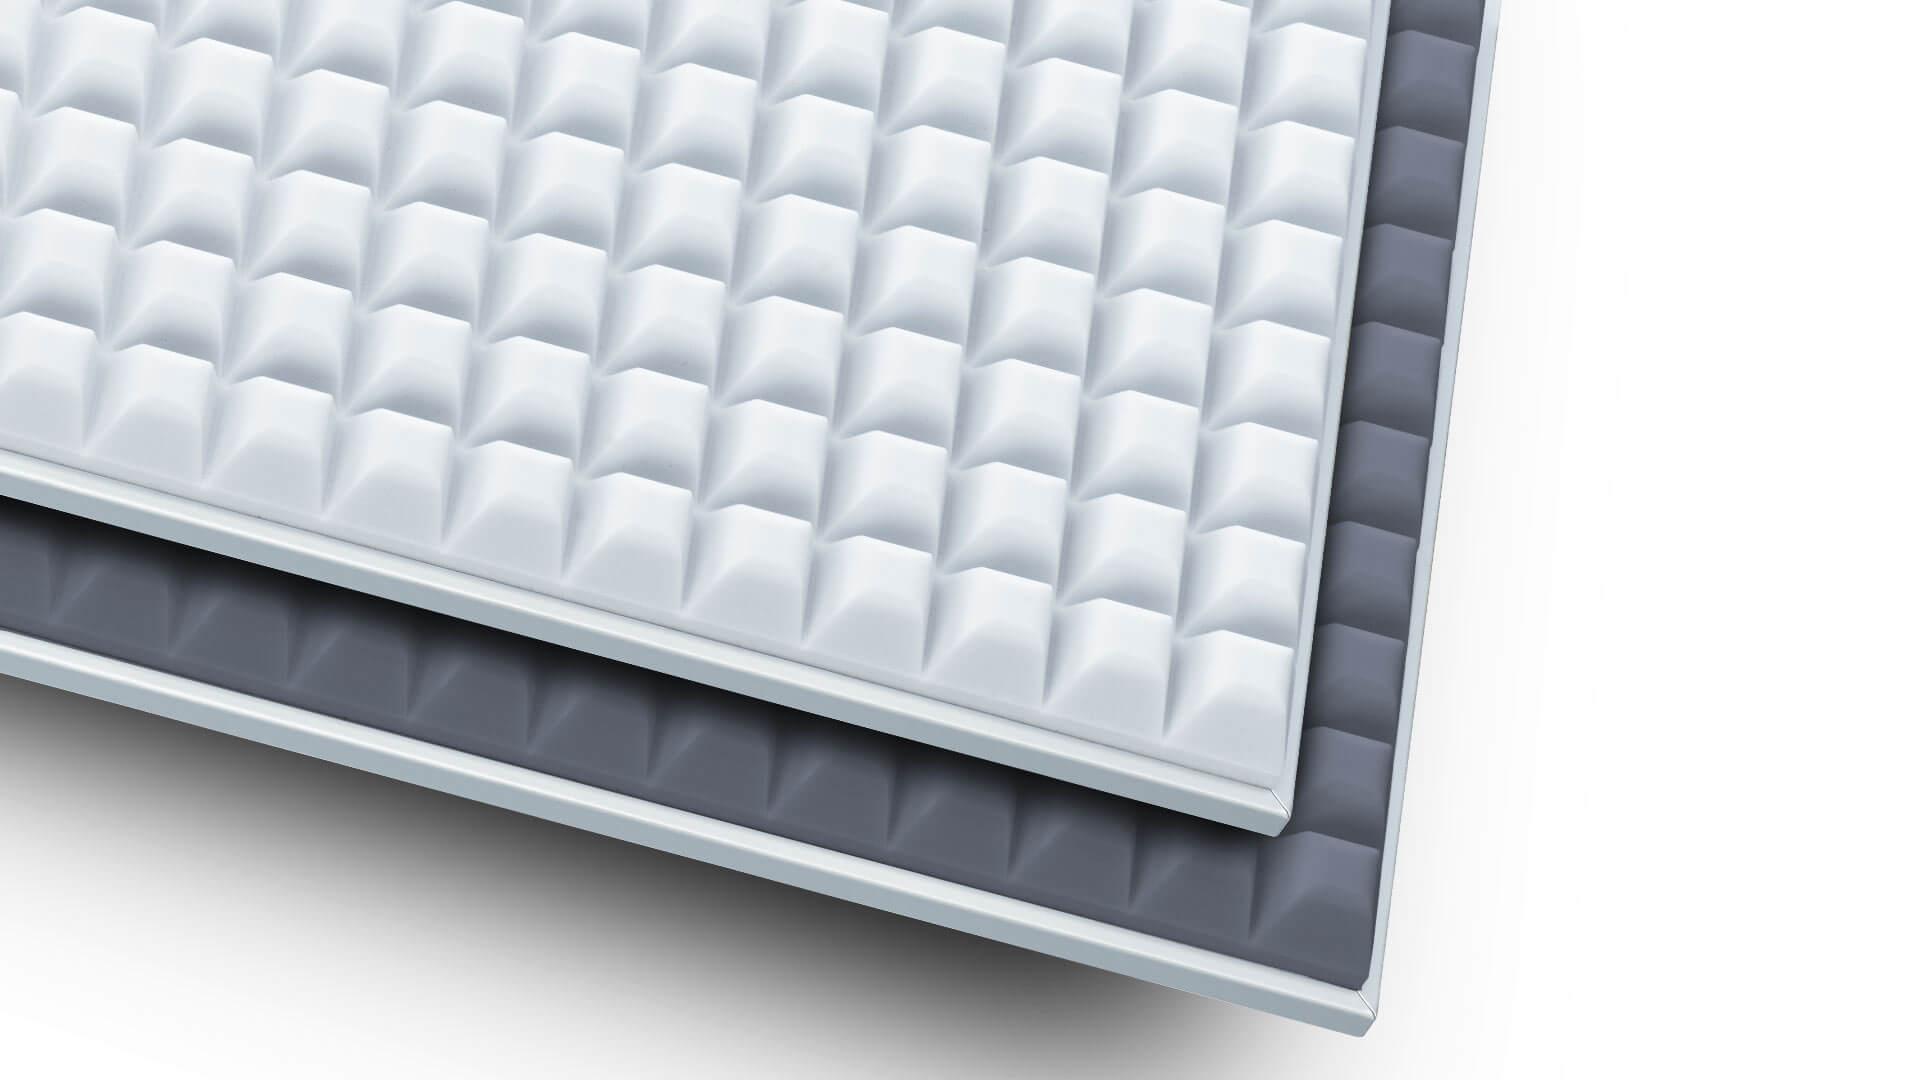 aixFOAM lydisolering - Premium-absorbenter for maksimal lydisolering